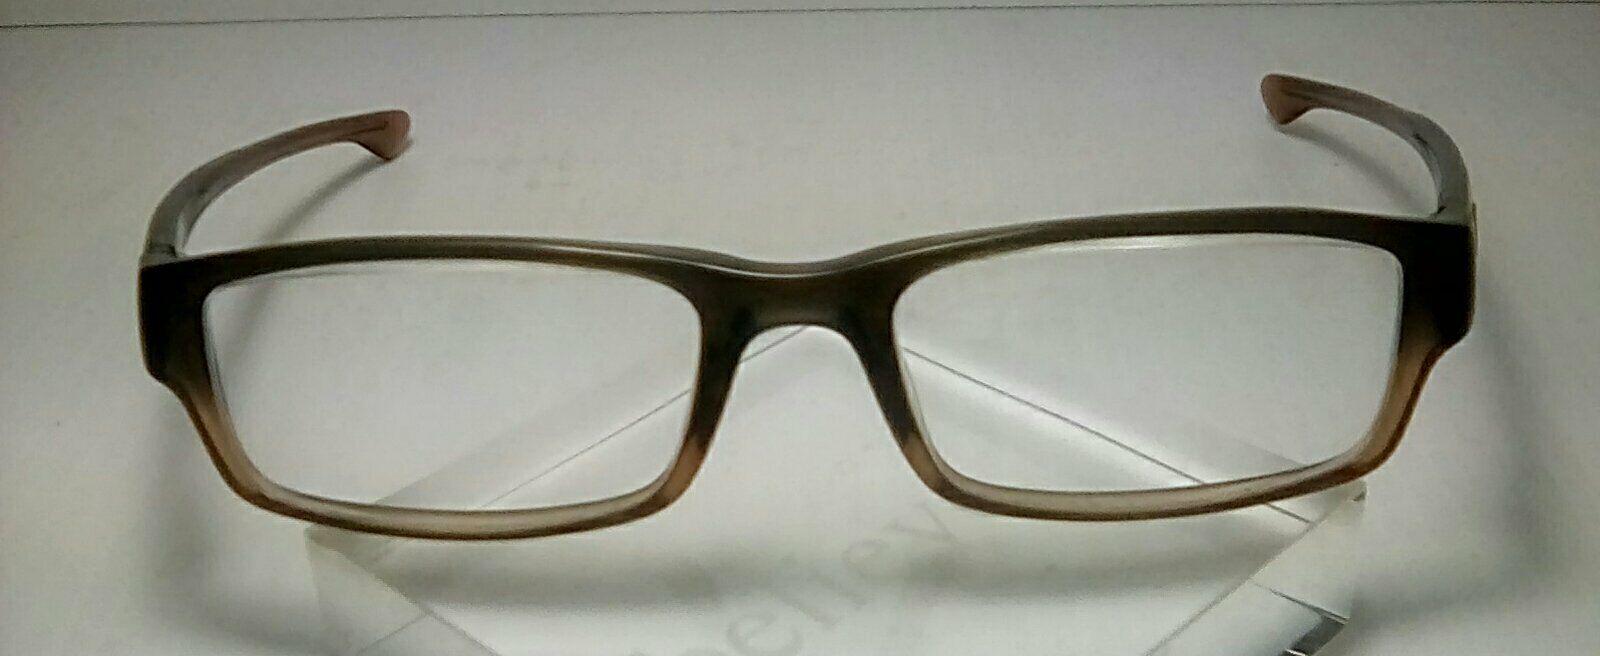 Oakley servo OX1066-0653 Grey Fade 53 18 140 Eyeglass/Sunglass Frames, 49.99 - $44.99